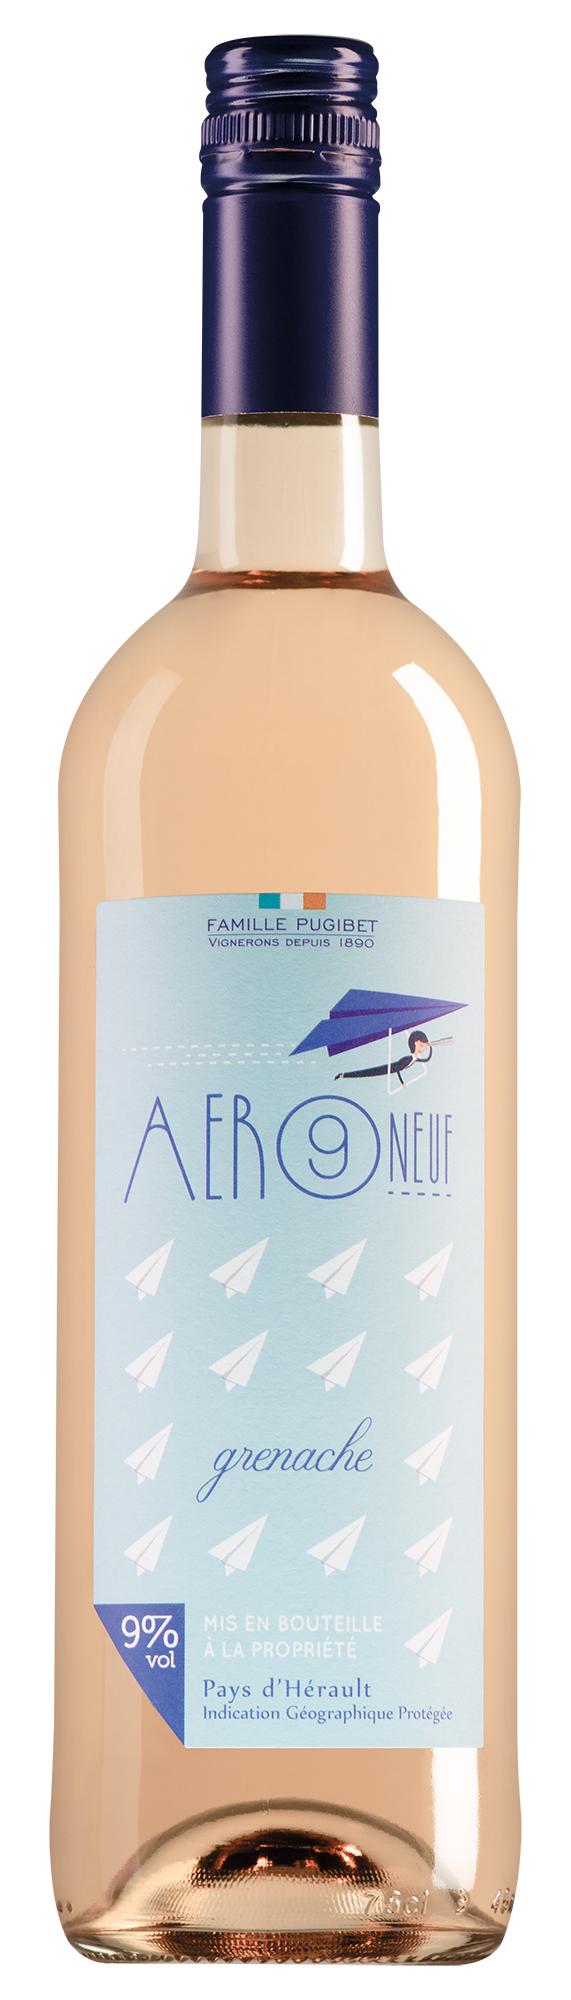 Famille Pugibet Pays d'Hérault Aer Neuf Grenache rosé